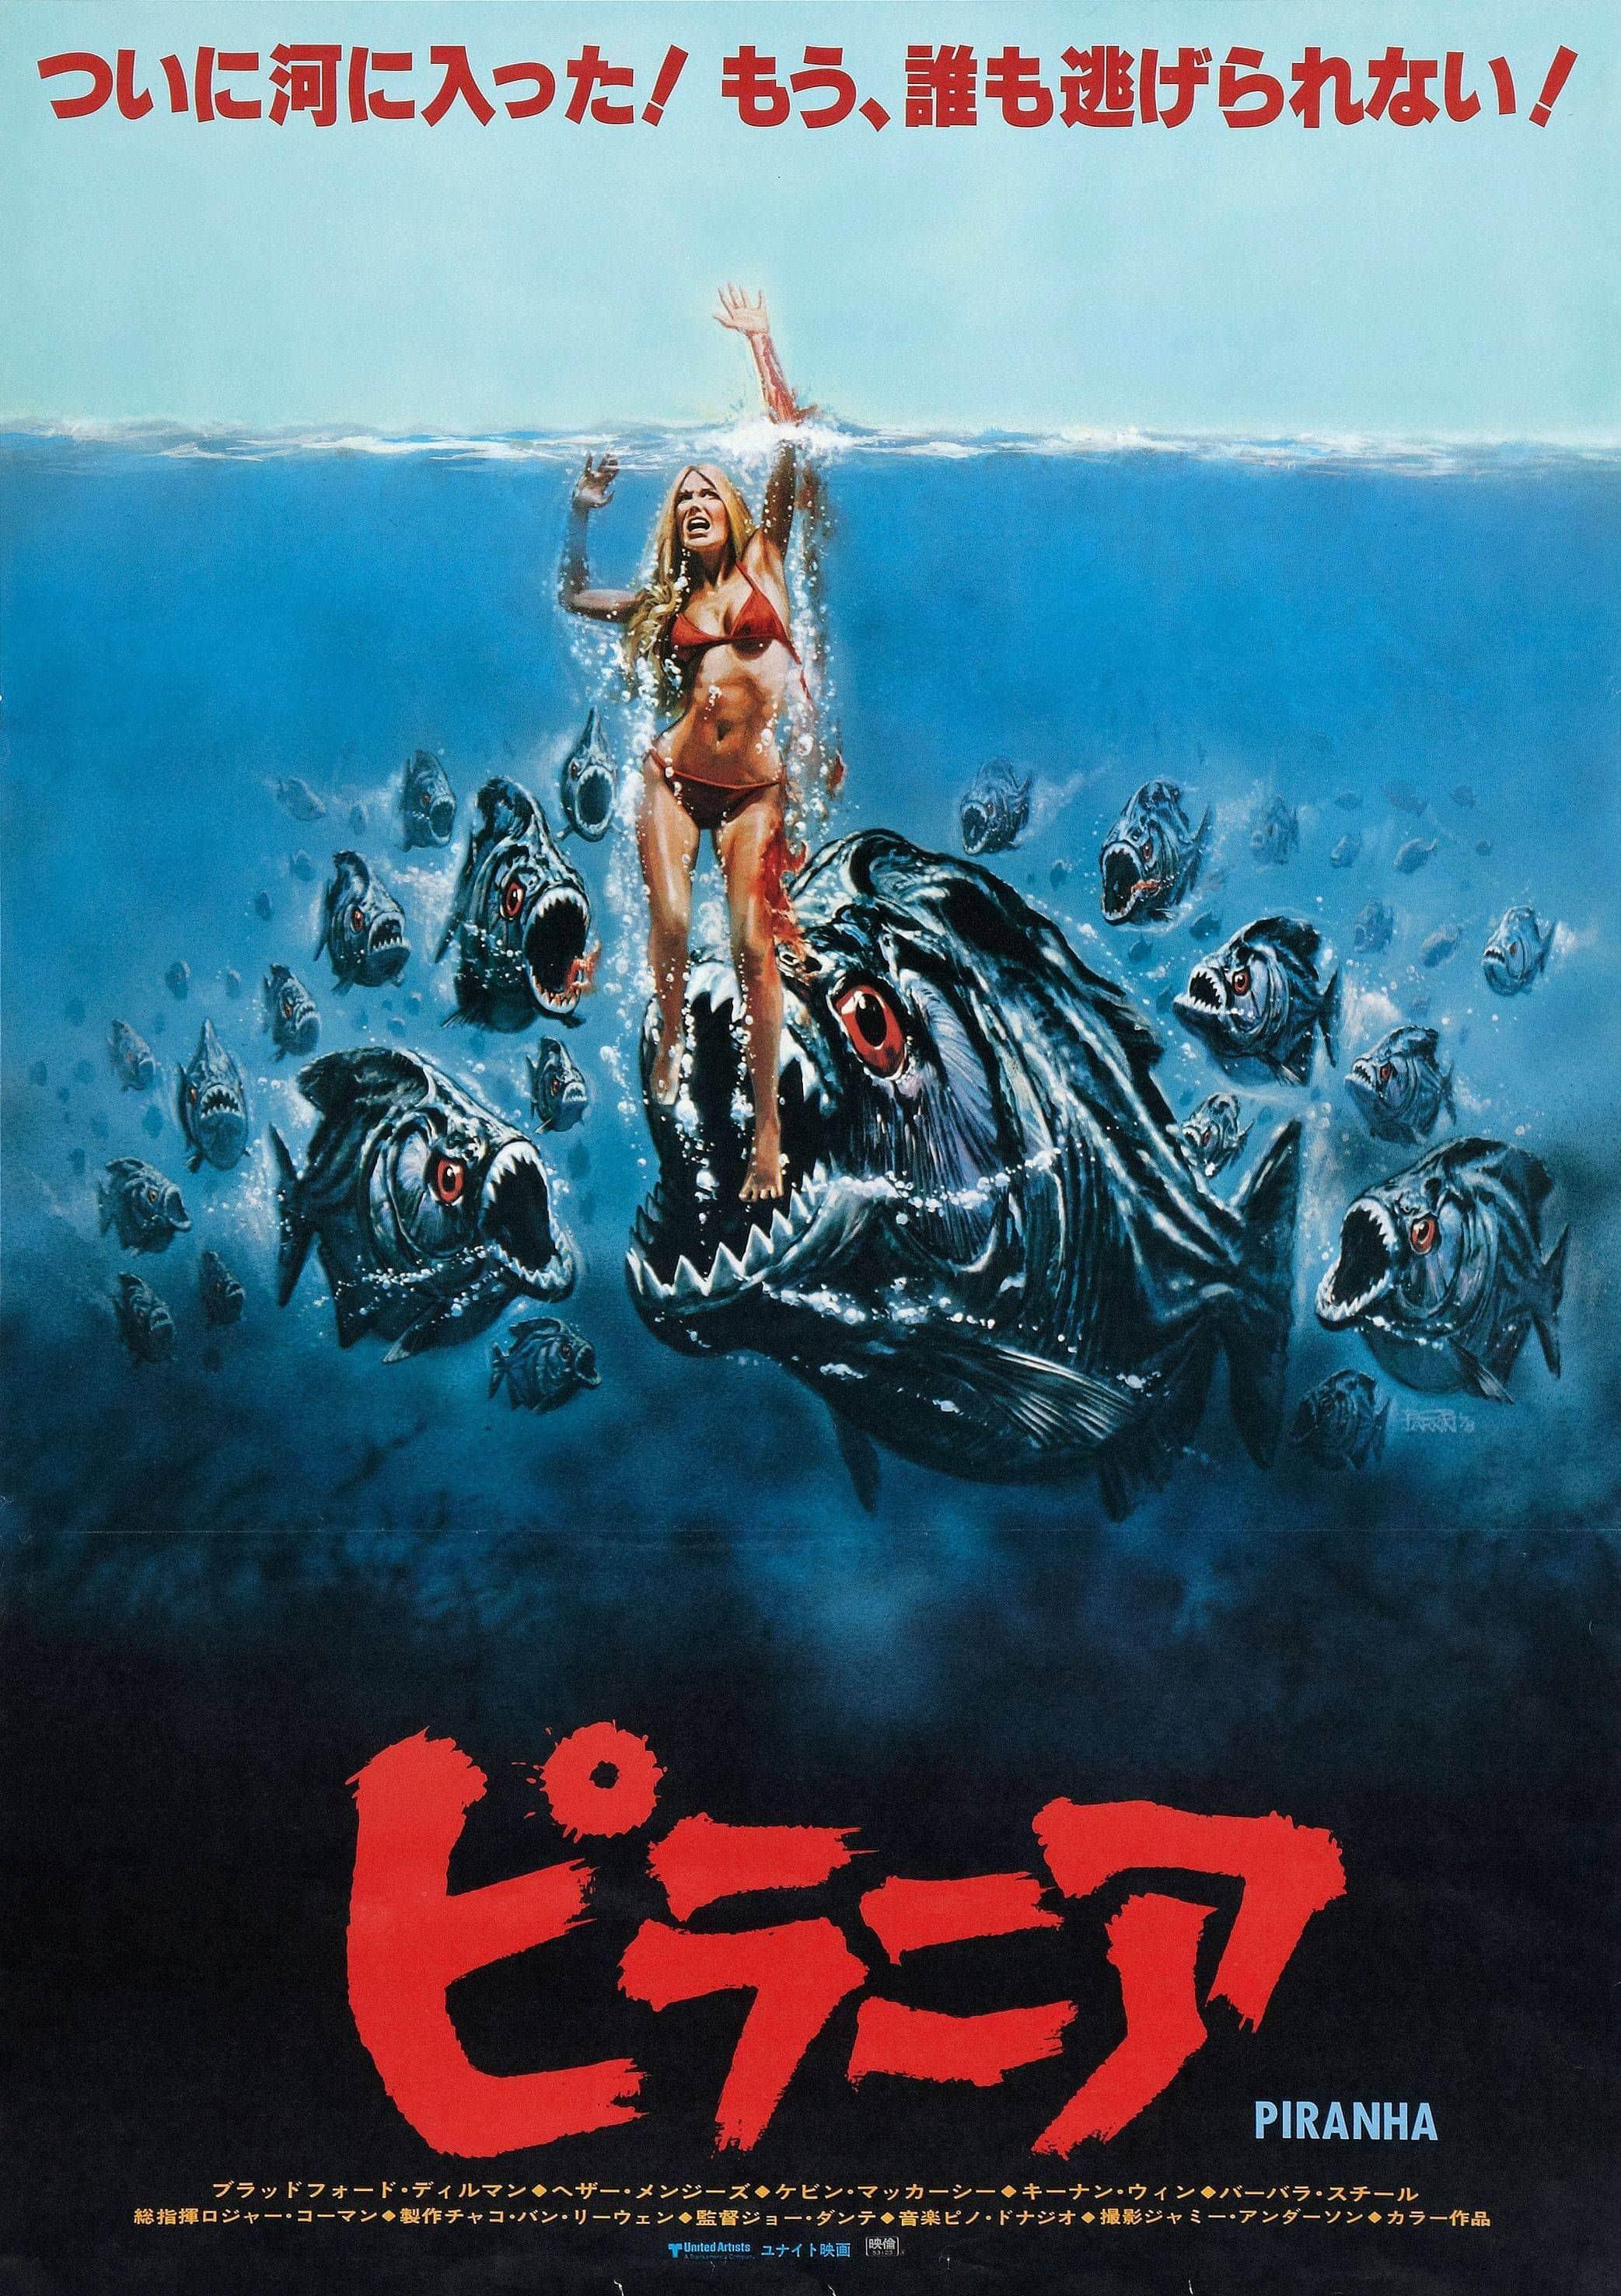 piranha japanese poster